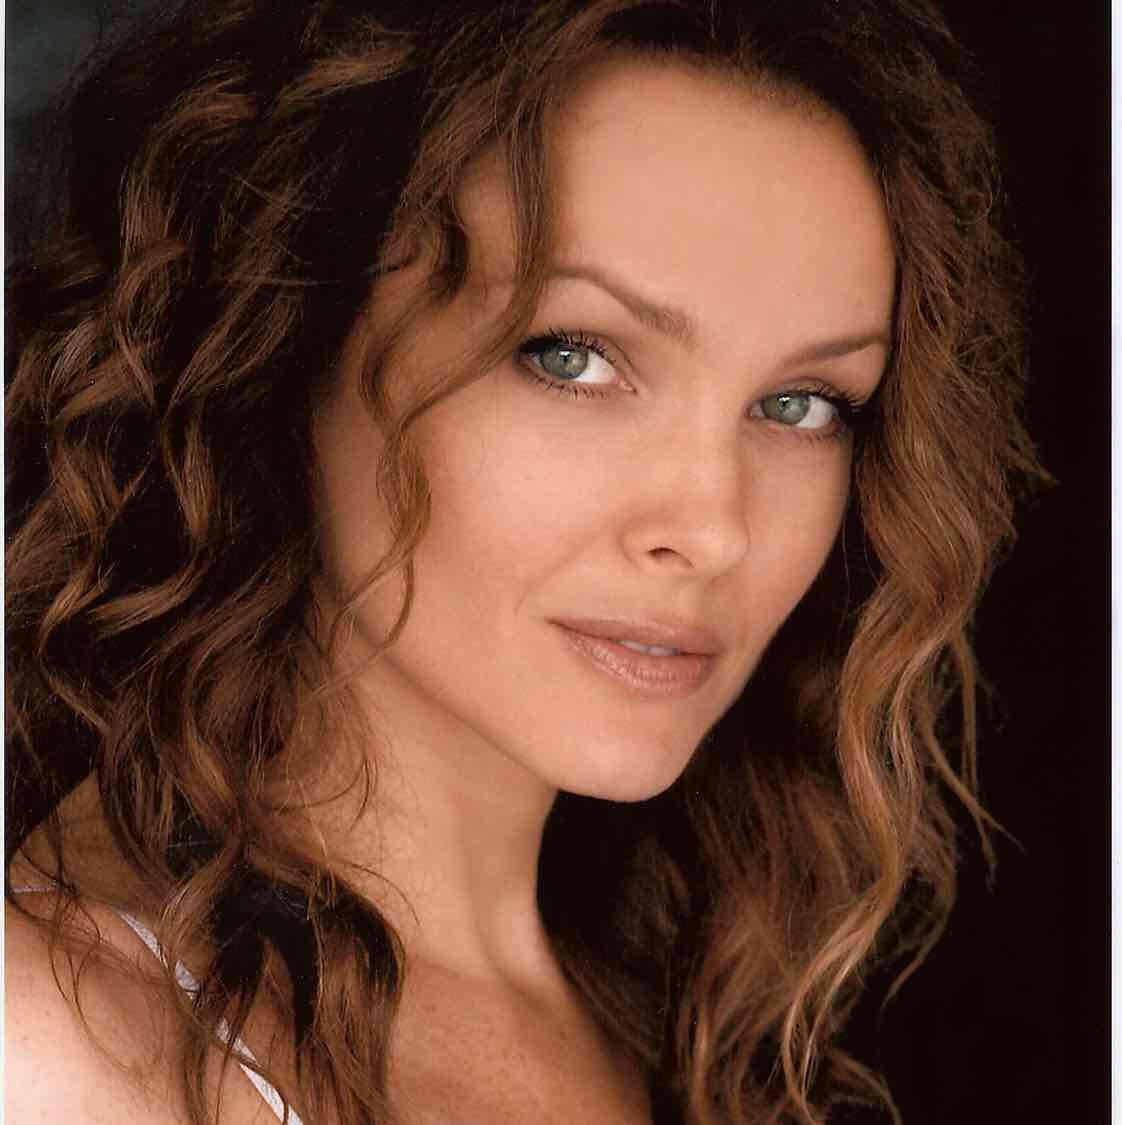 Avatar of Dina Meyer